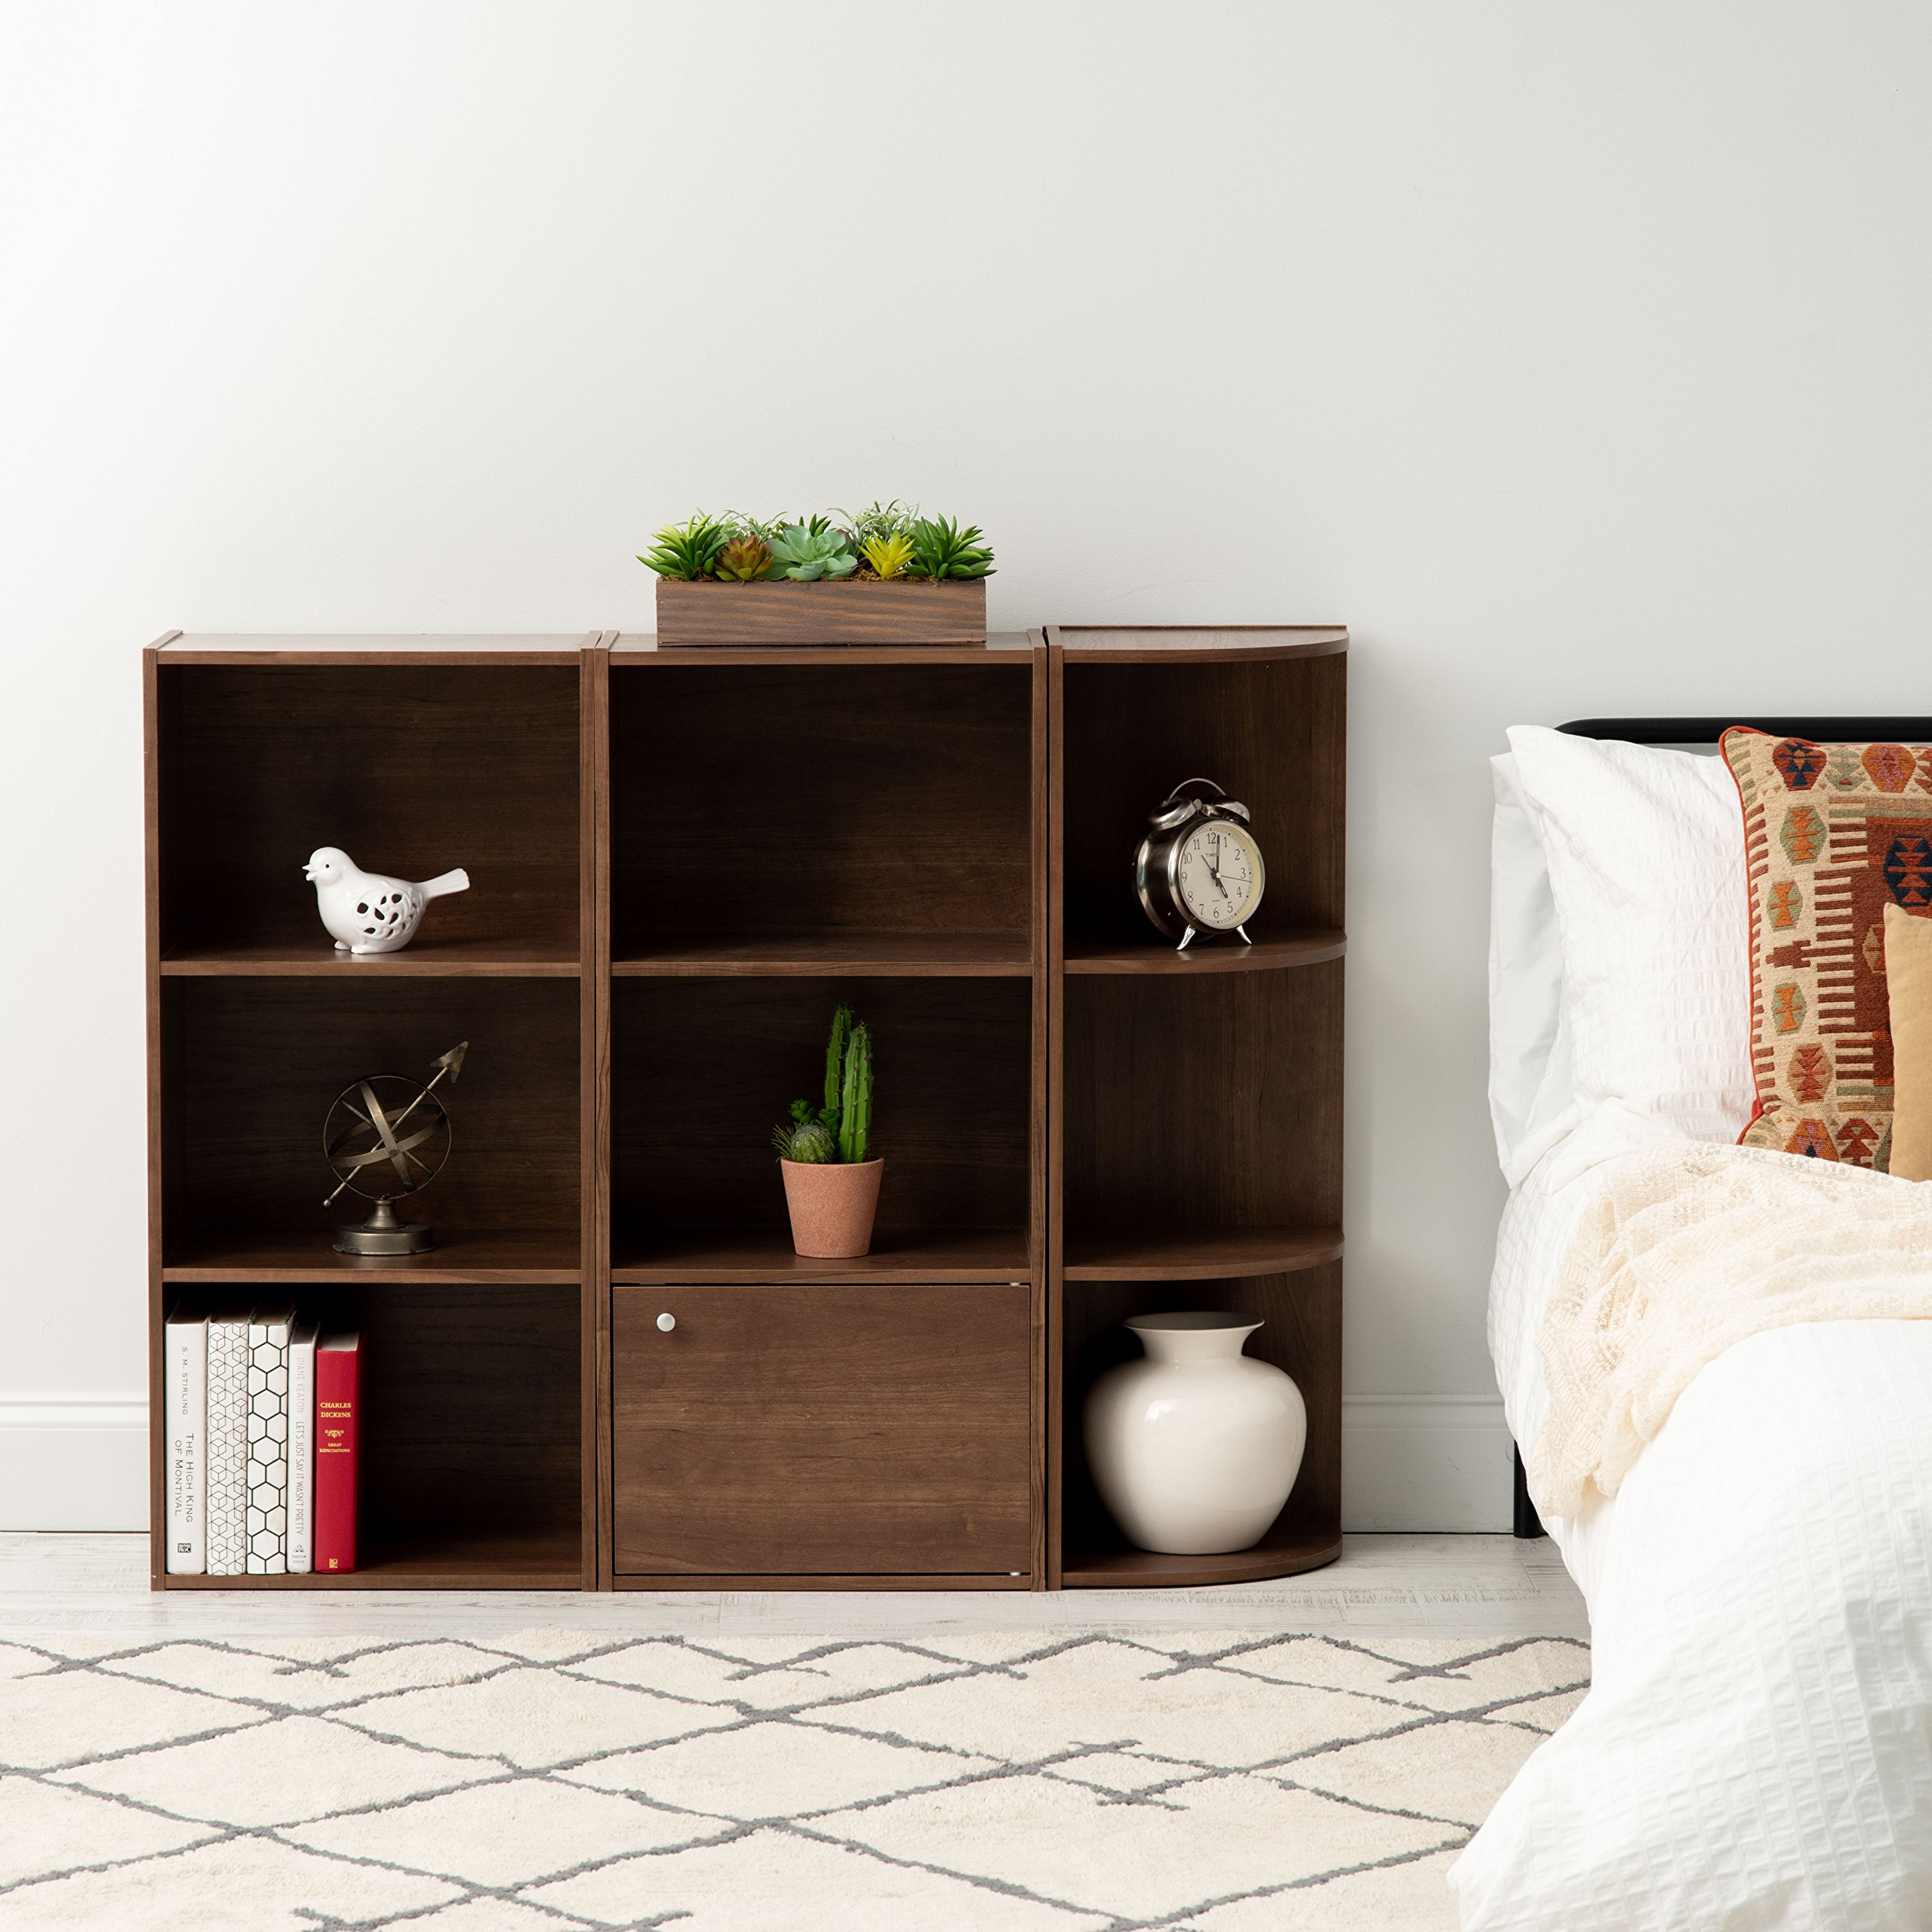 IRIS 3-Tier Basic Wood Bookcase Storage Shelf, Dark Brown by IRIS USA, Inc. (Image #4)